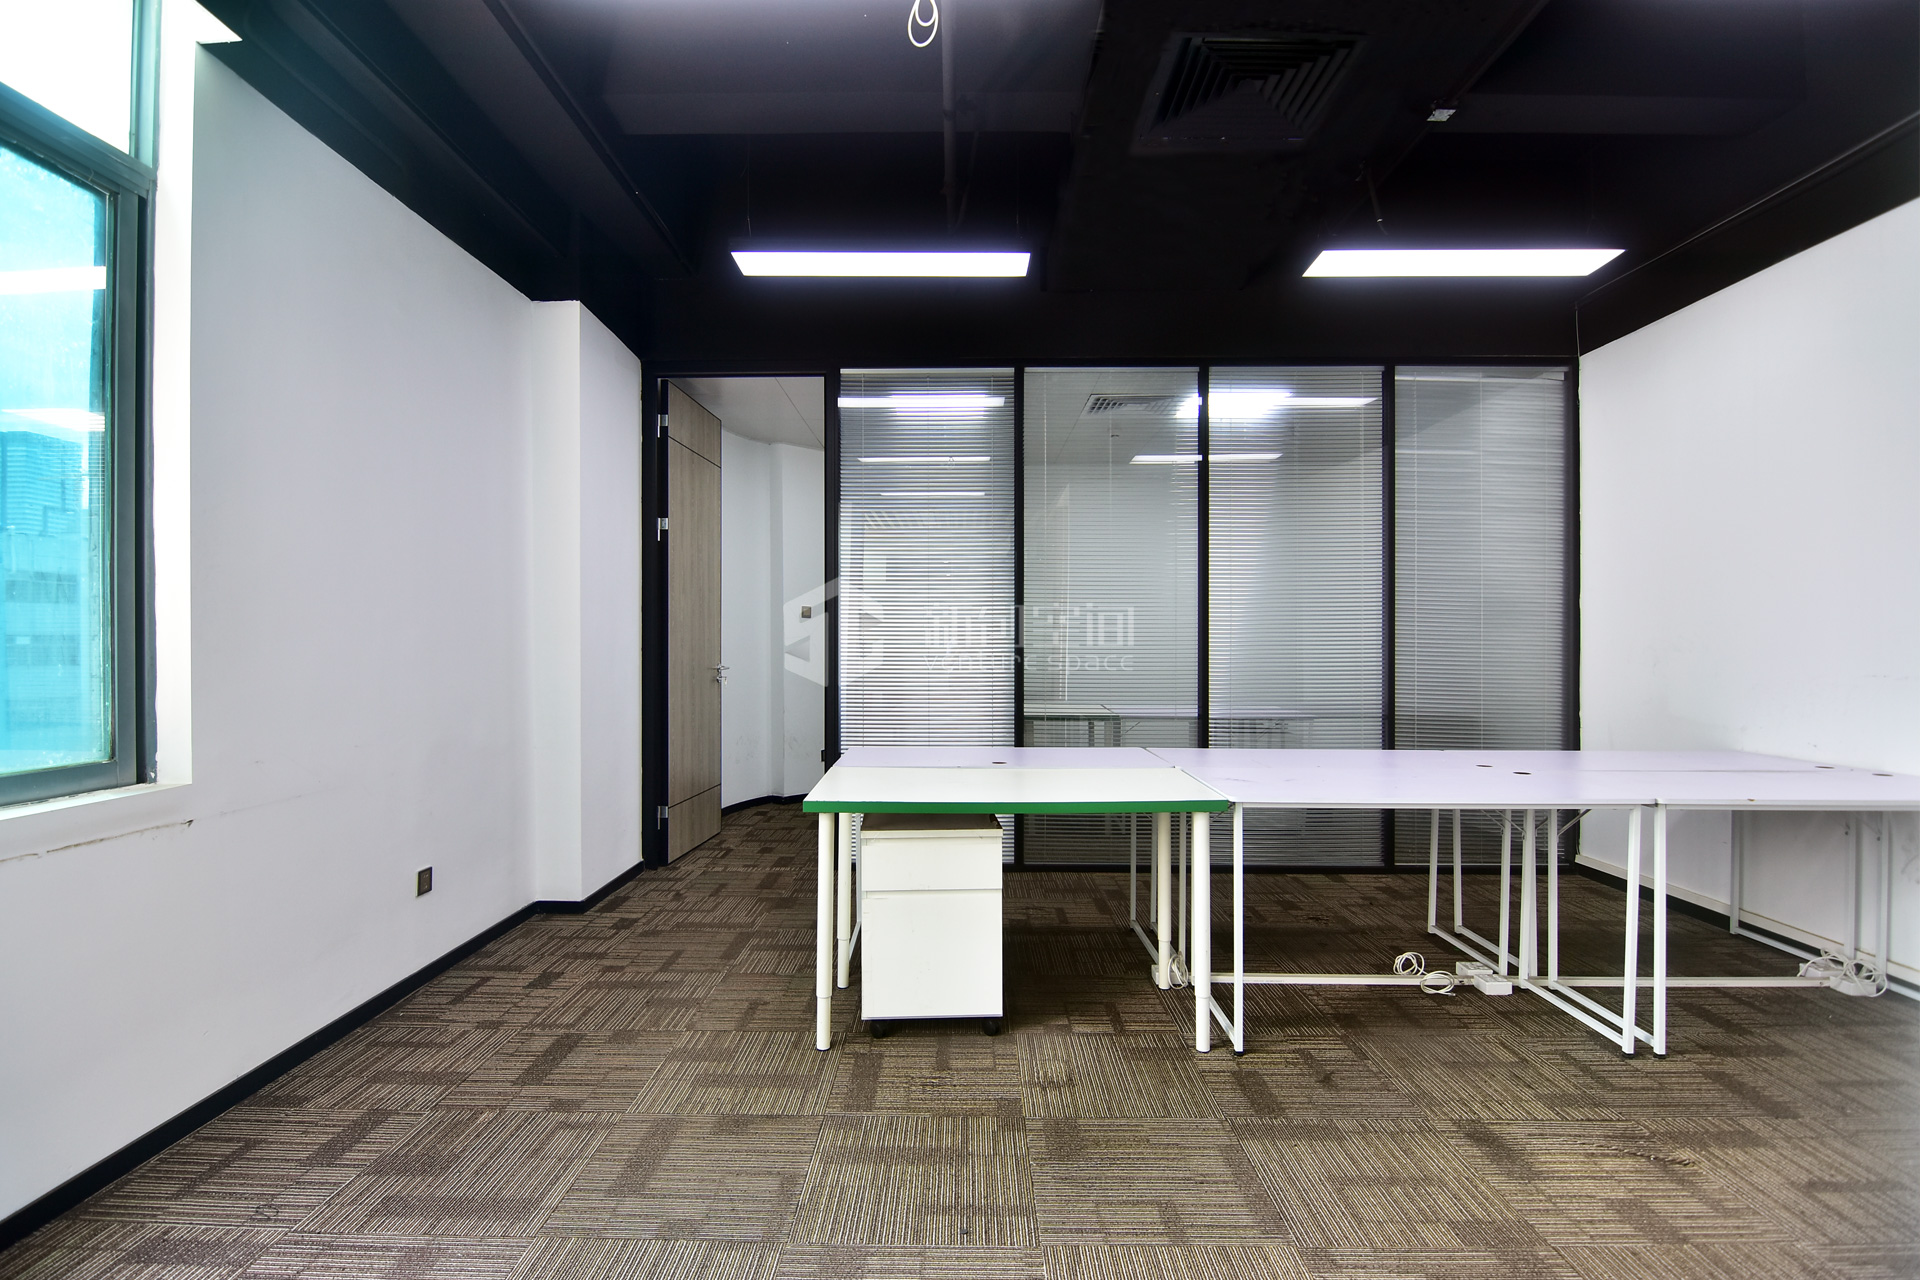 120m²·高新技术产业园